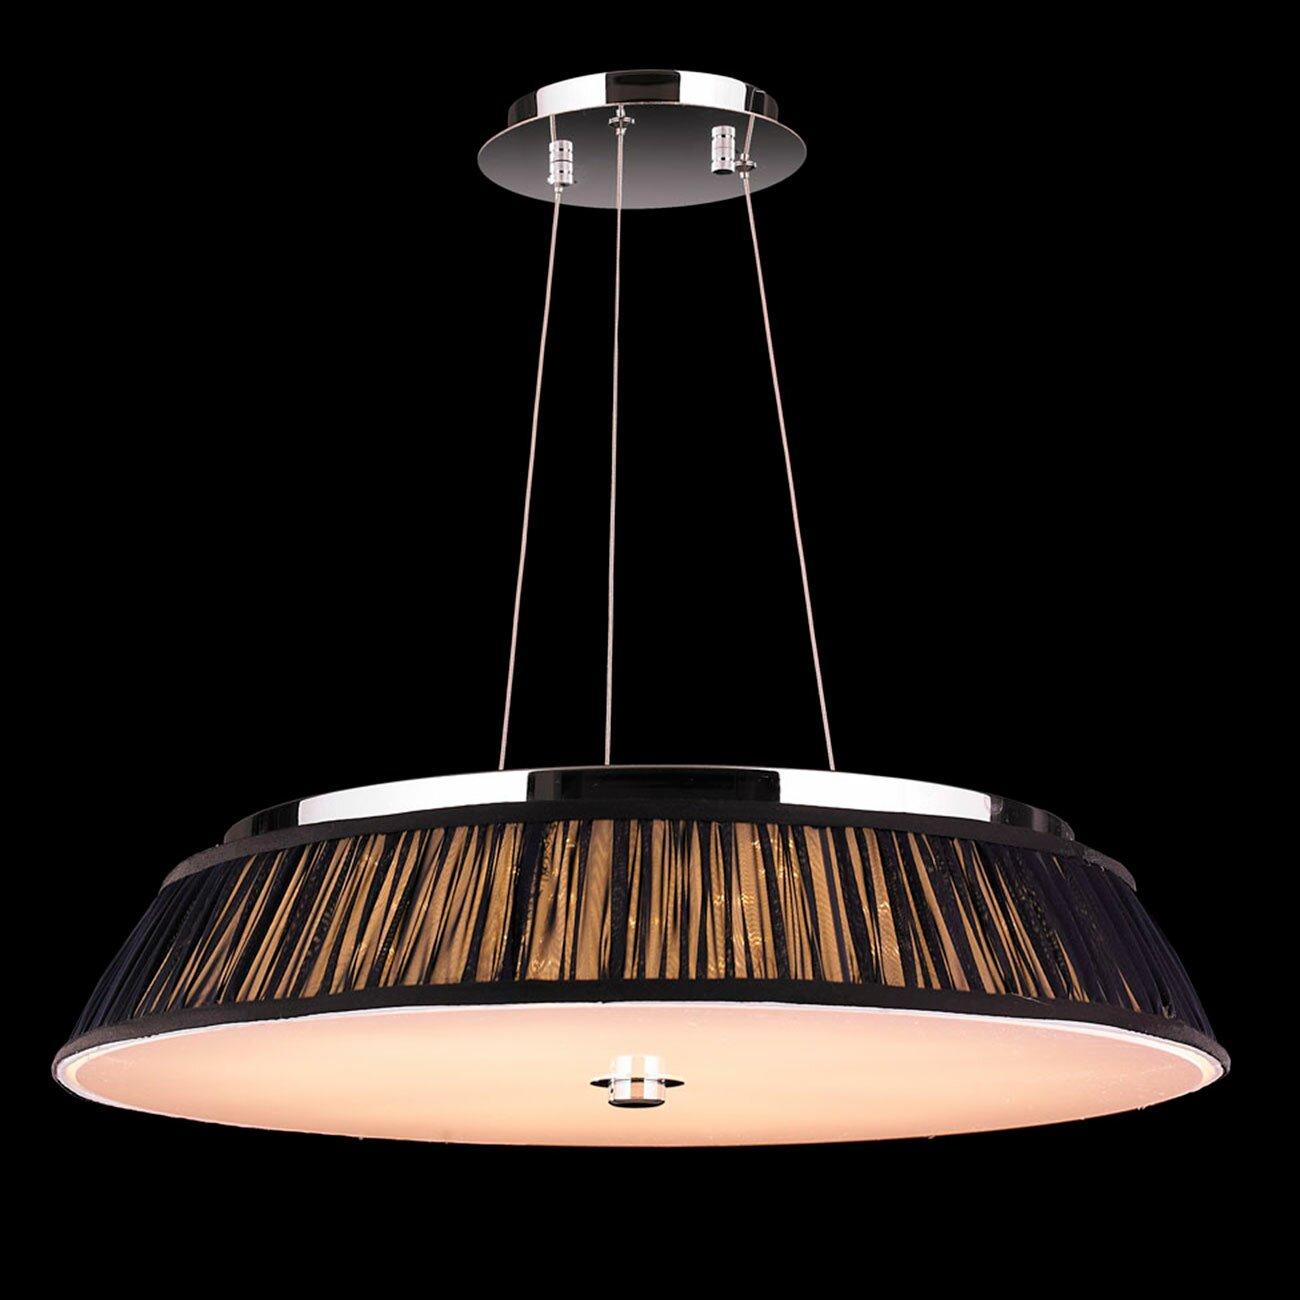 Worldwide Lighting Alice 12 Light Drum Pendant & Reviews ...